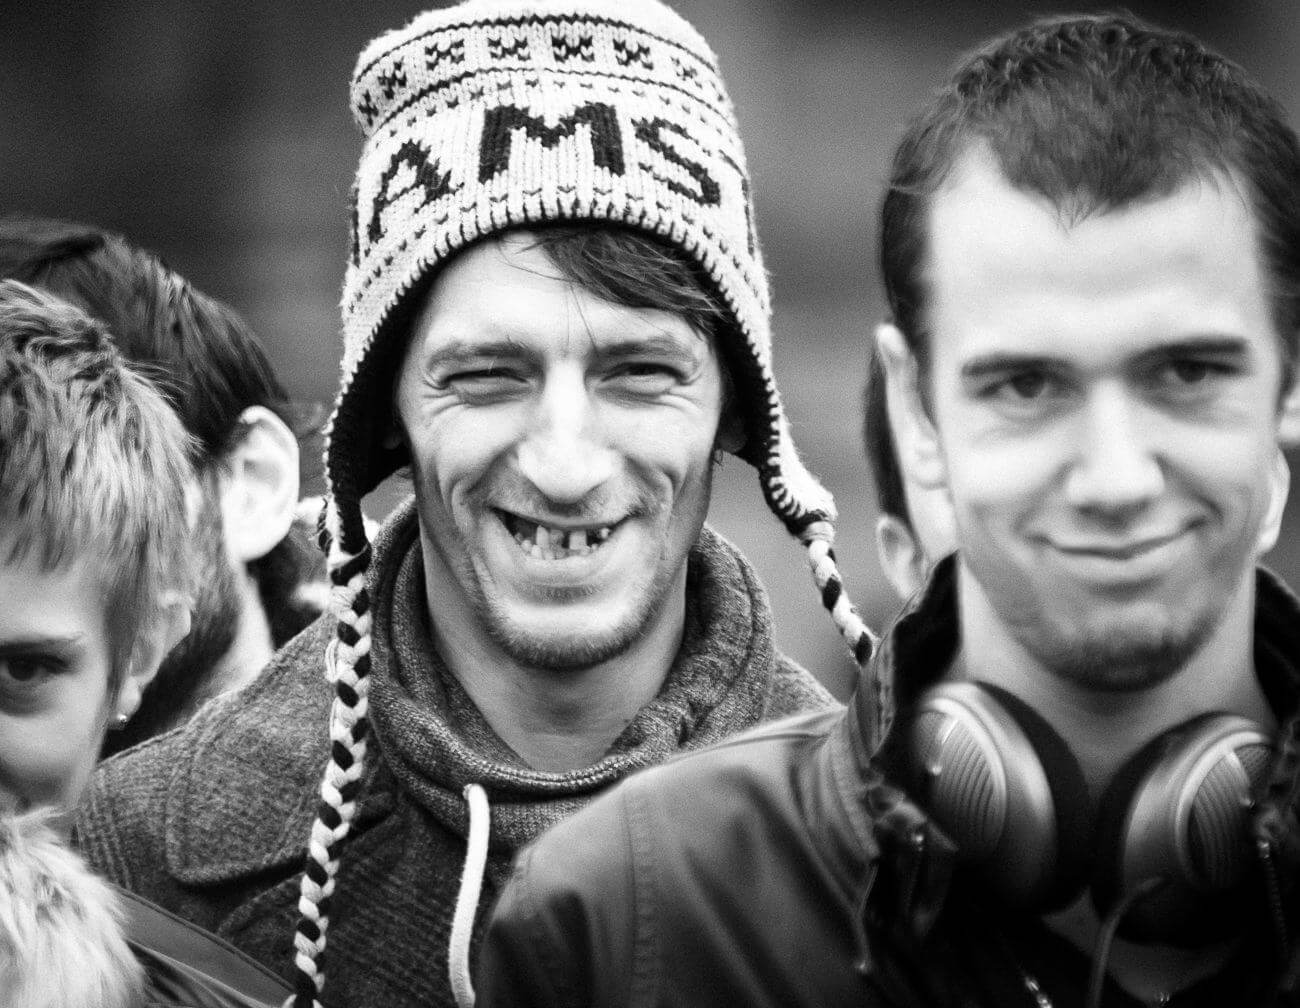 People of Amsterdam - photograph by Zdenek Sindelar / CuriousZed